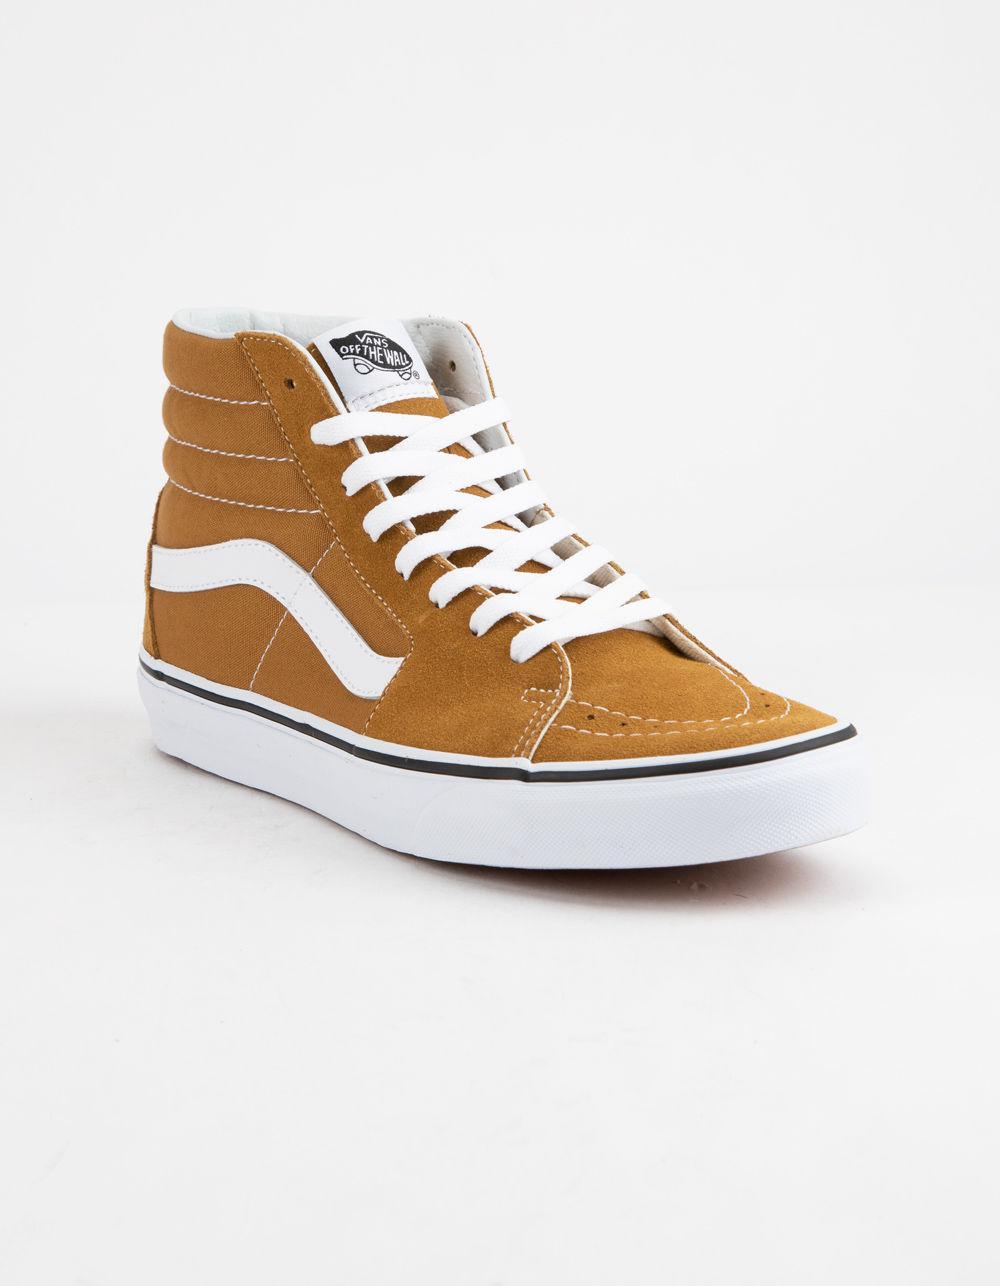 457aca88d5b Lyst - Vans Sk8-hi Cumin   True White Shoes in White for Men